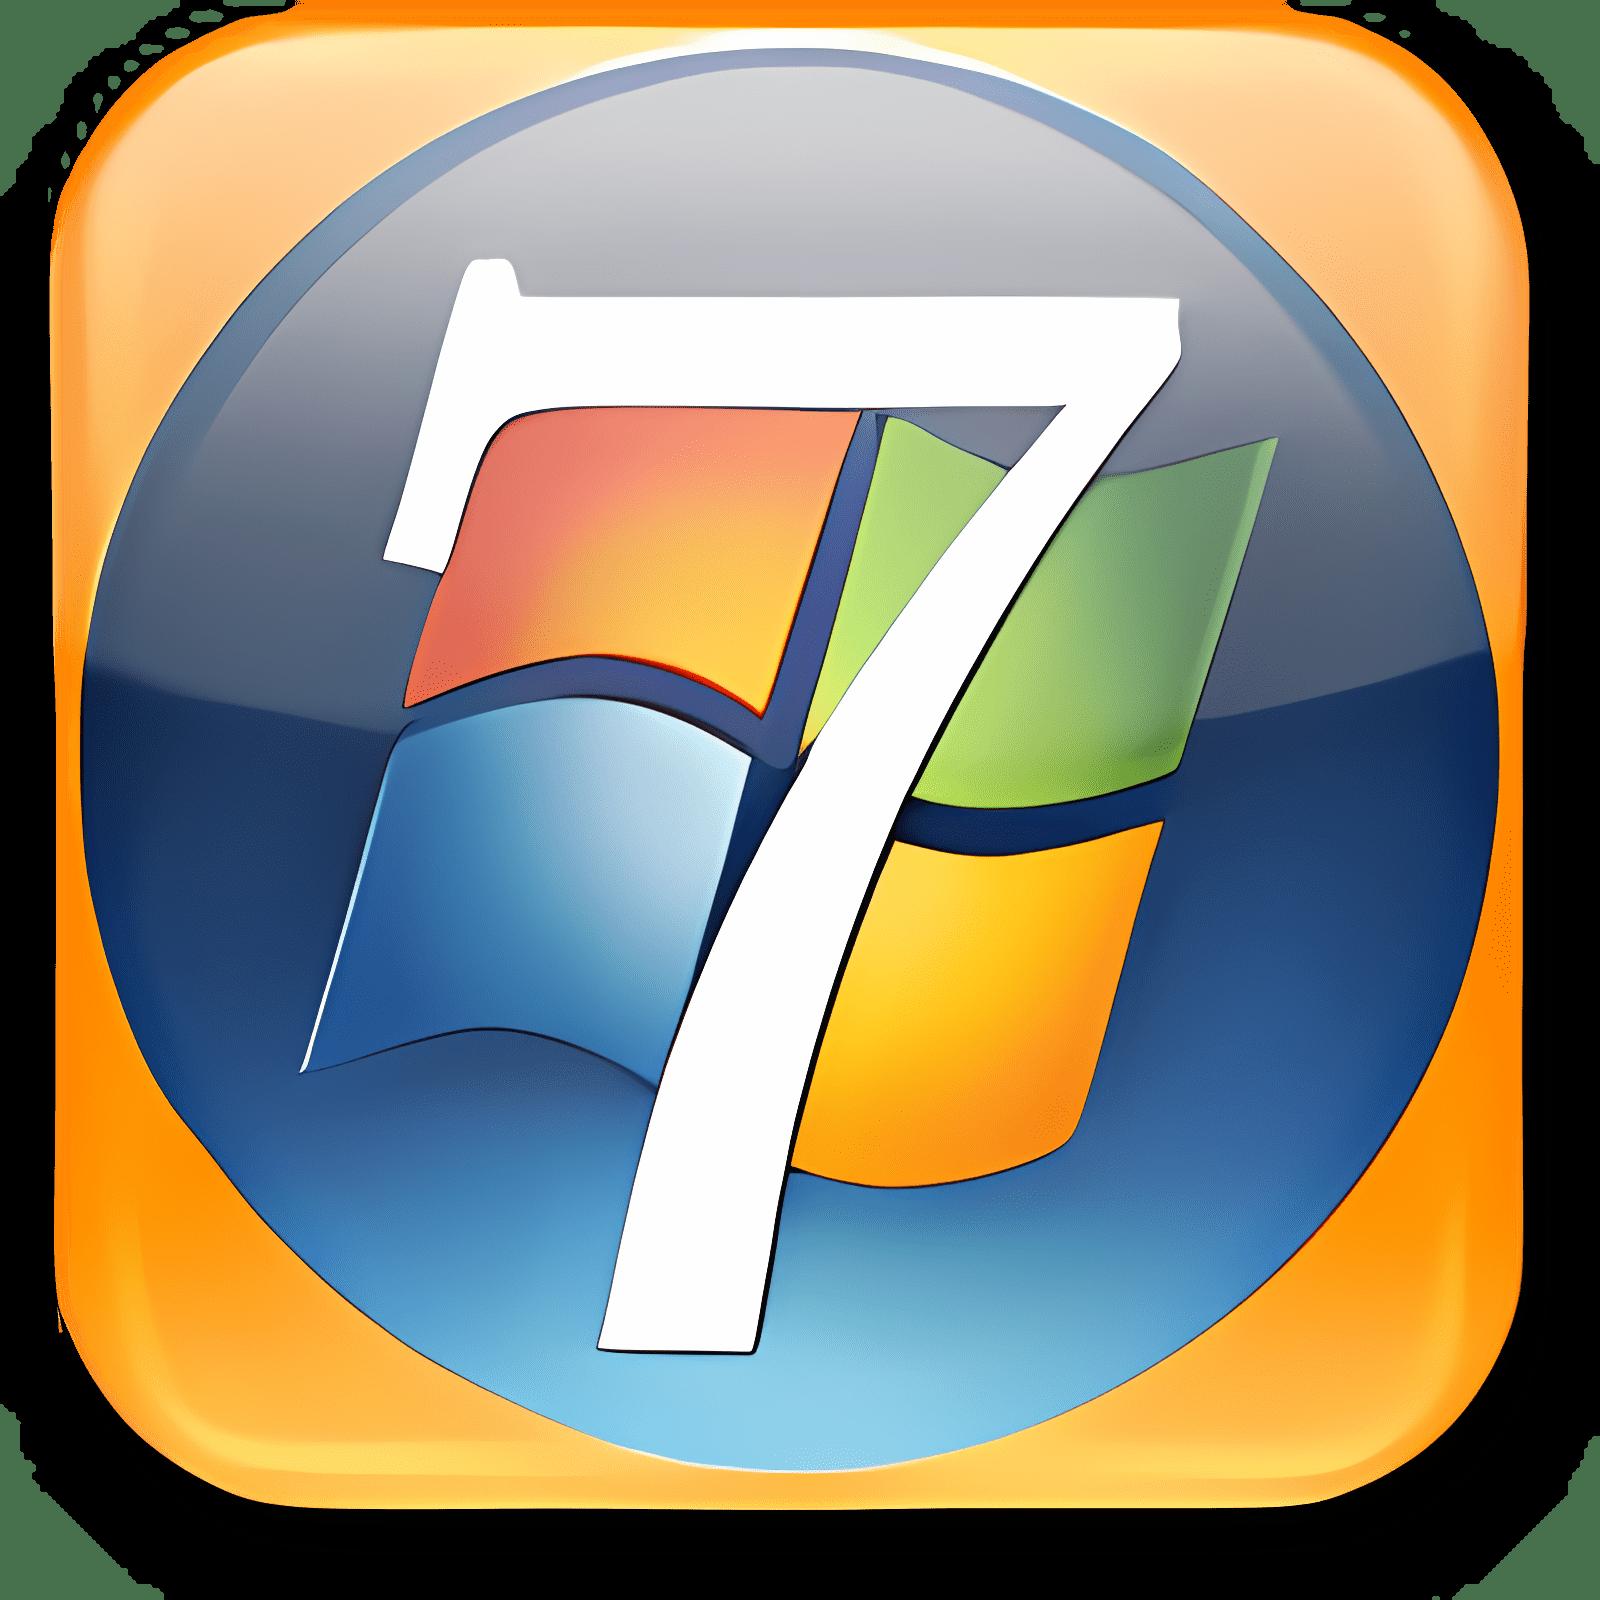 SevenVG RC (Windows 7 Thema)